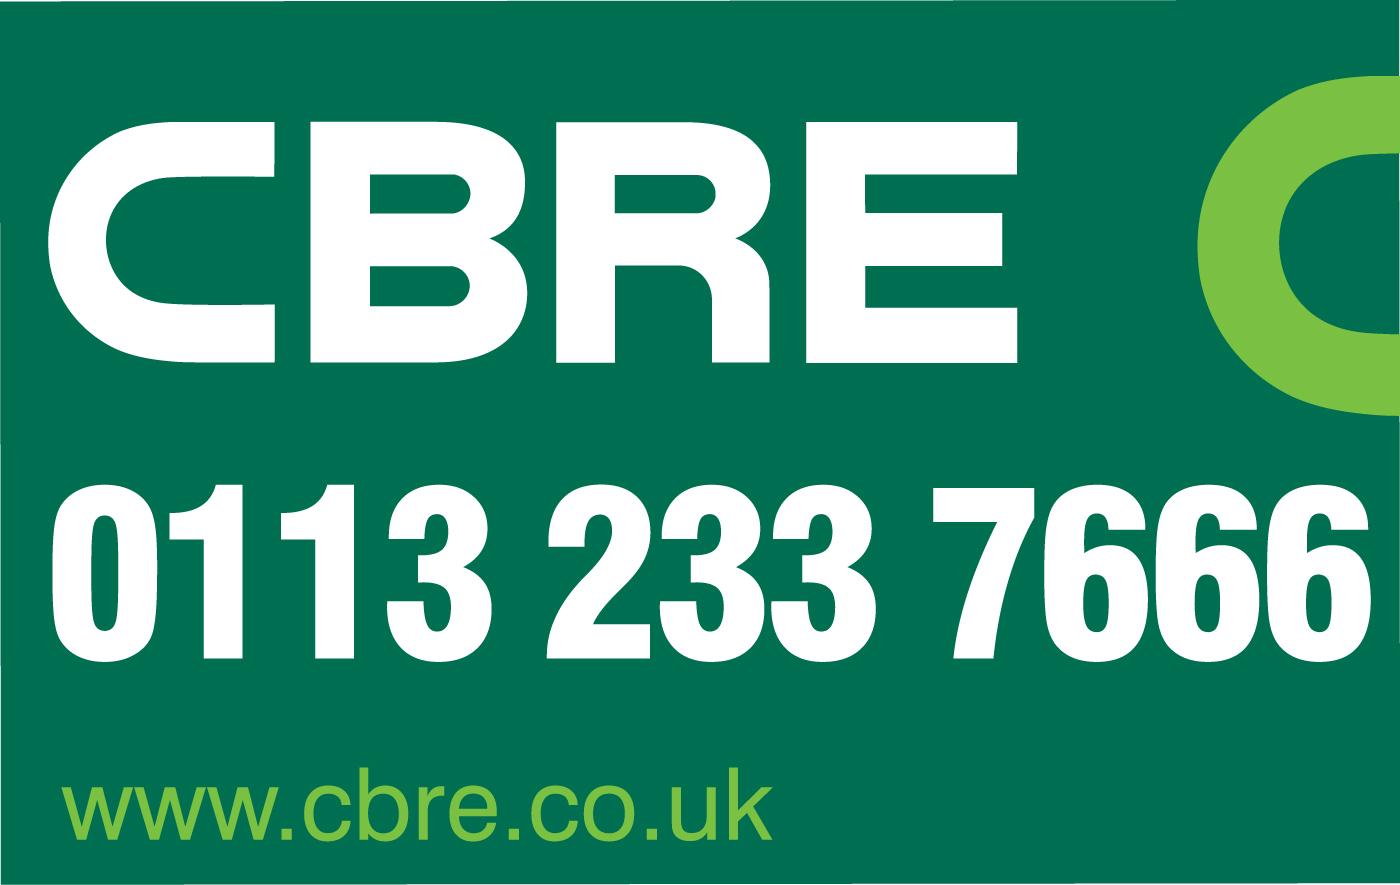 CBRE Agents logo Leeds